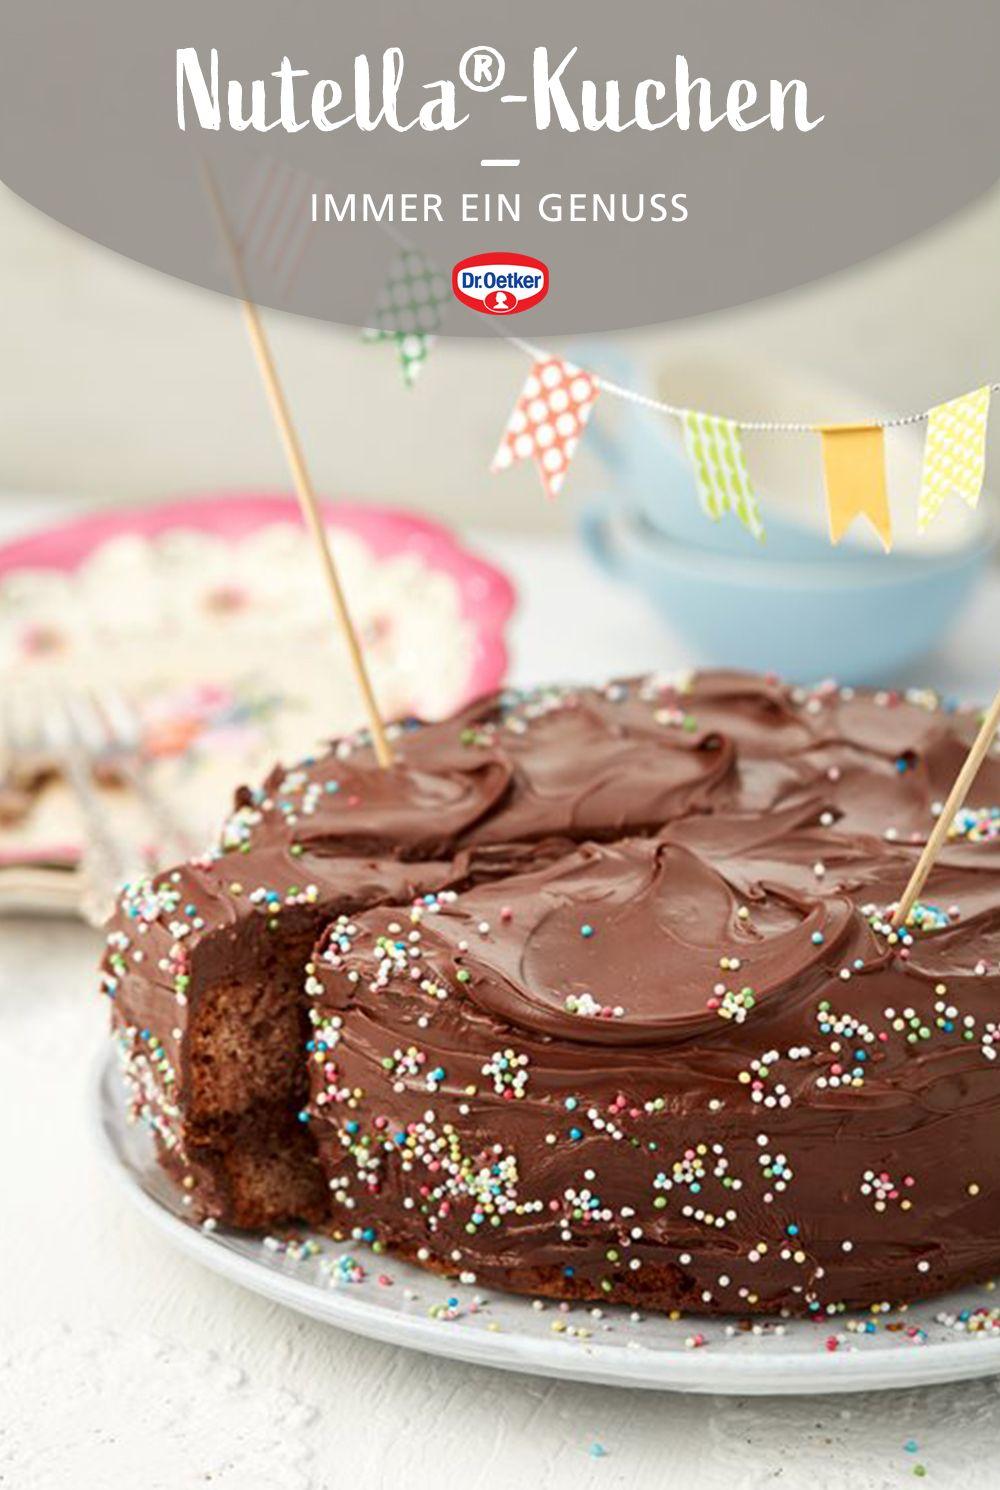 342126d1dfeb77ee1f6f974beae0e8d6 - Nutella Kuchen Rezepte